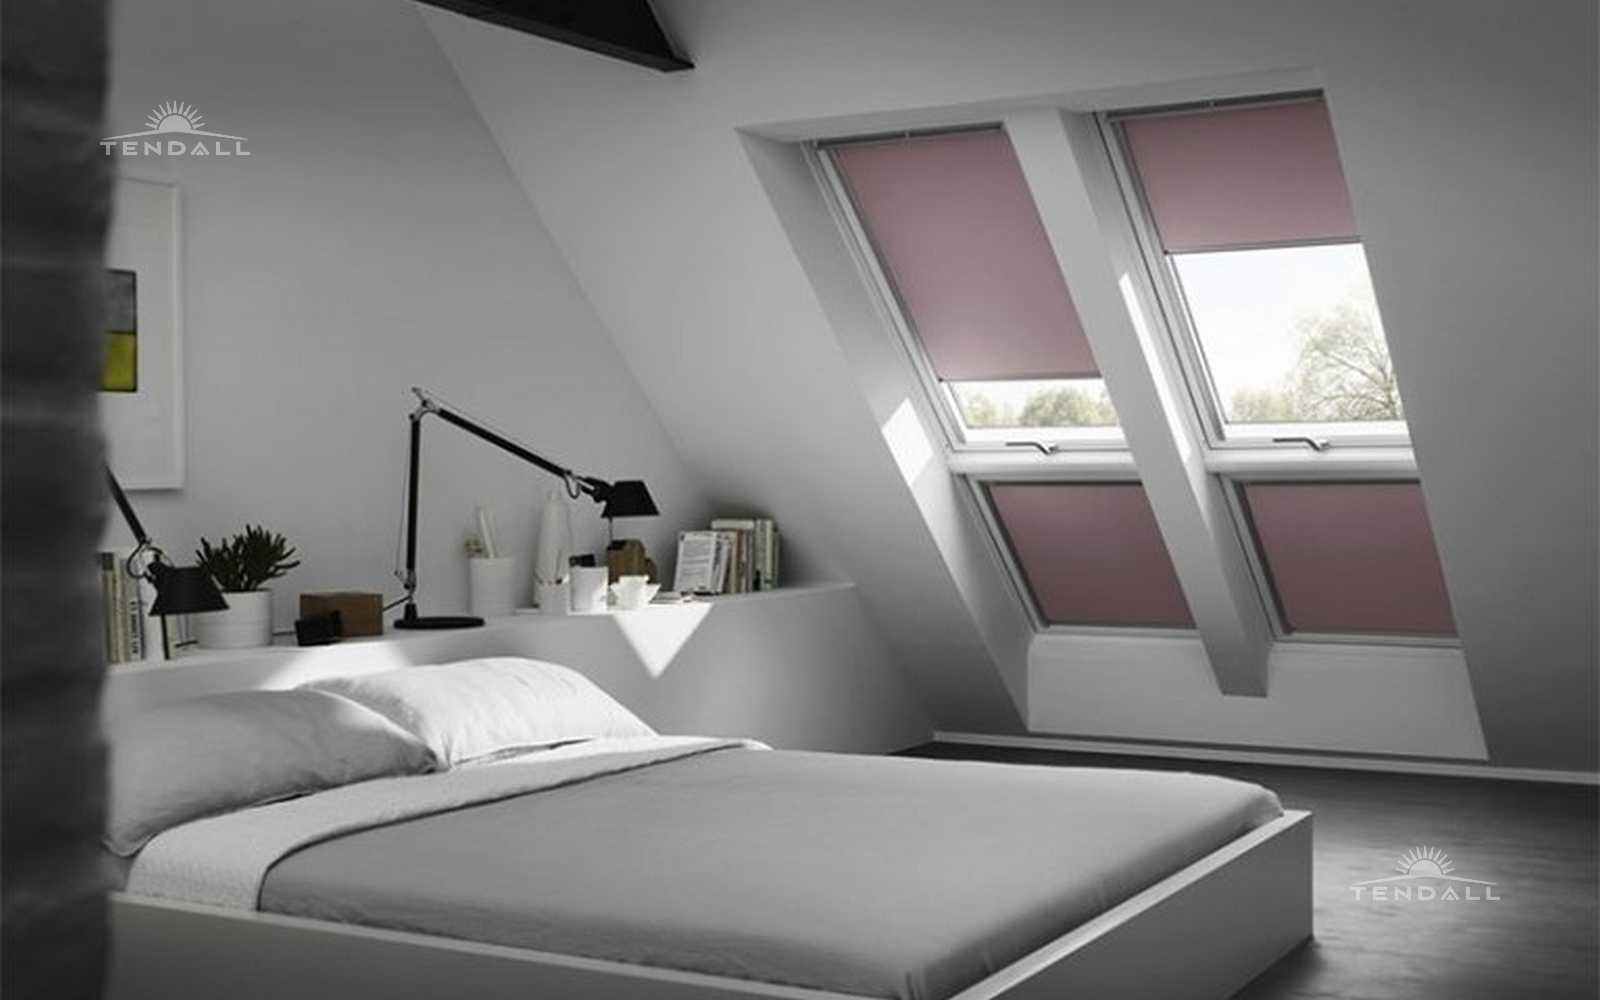 Tende per lucernari tendall - Tende per finestre da tetto ...